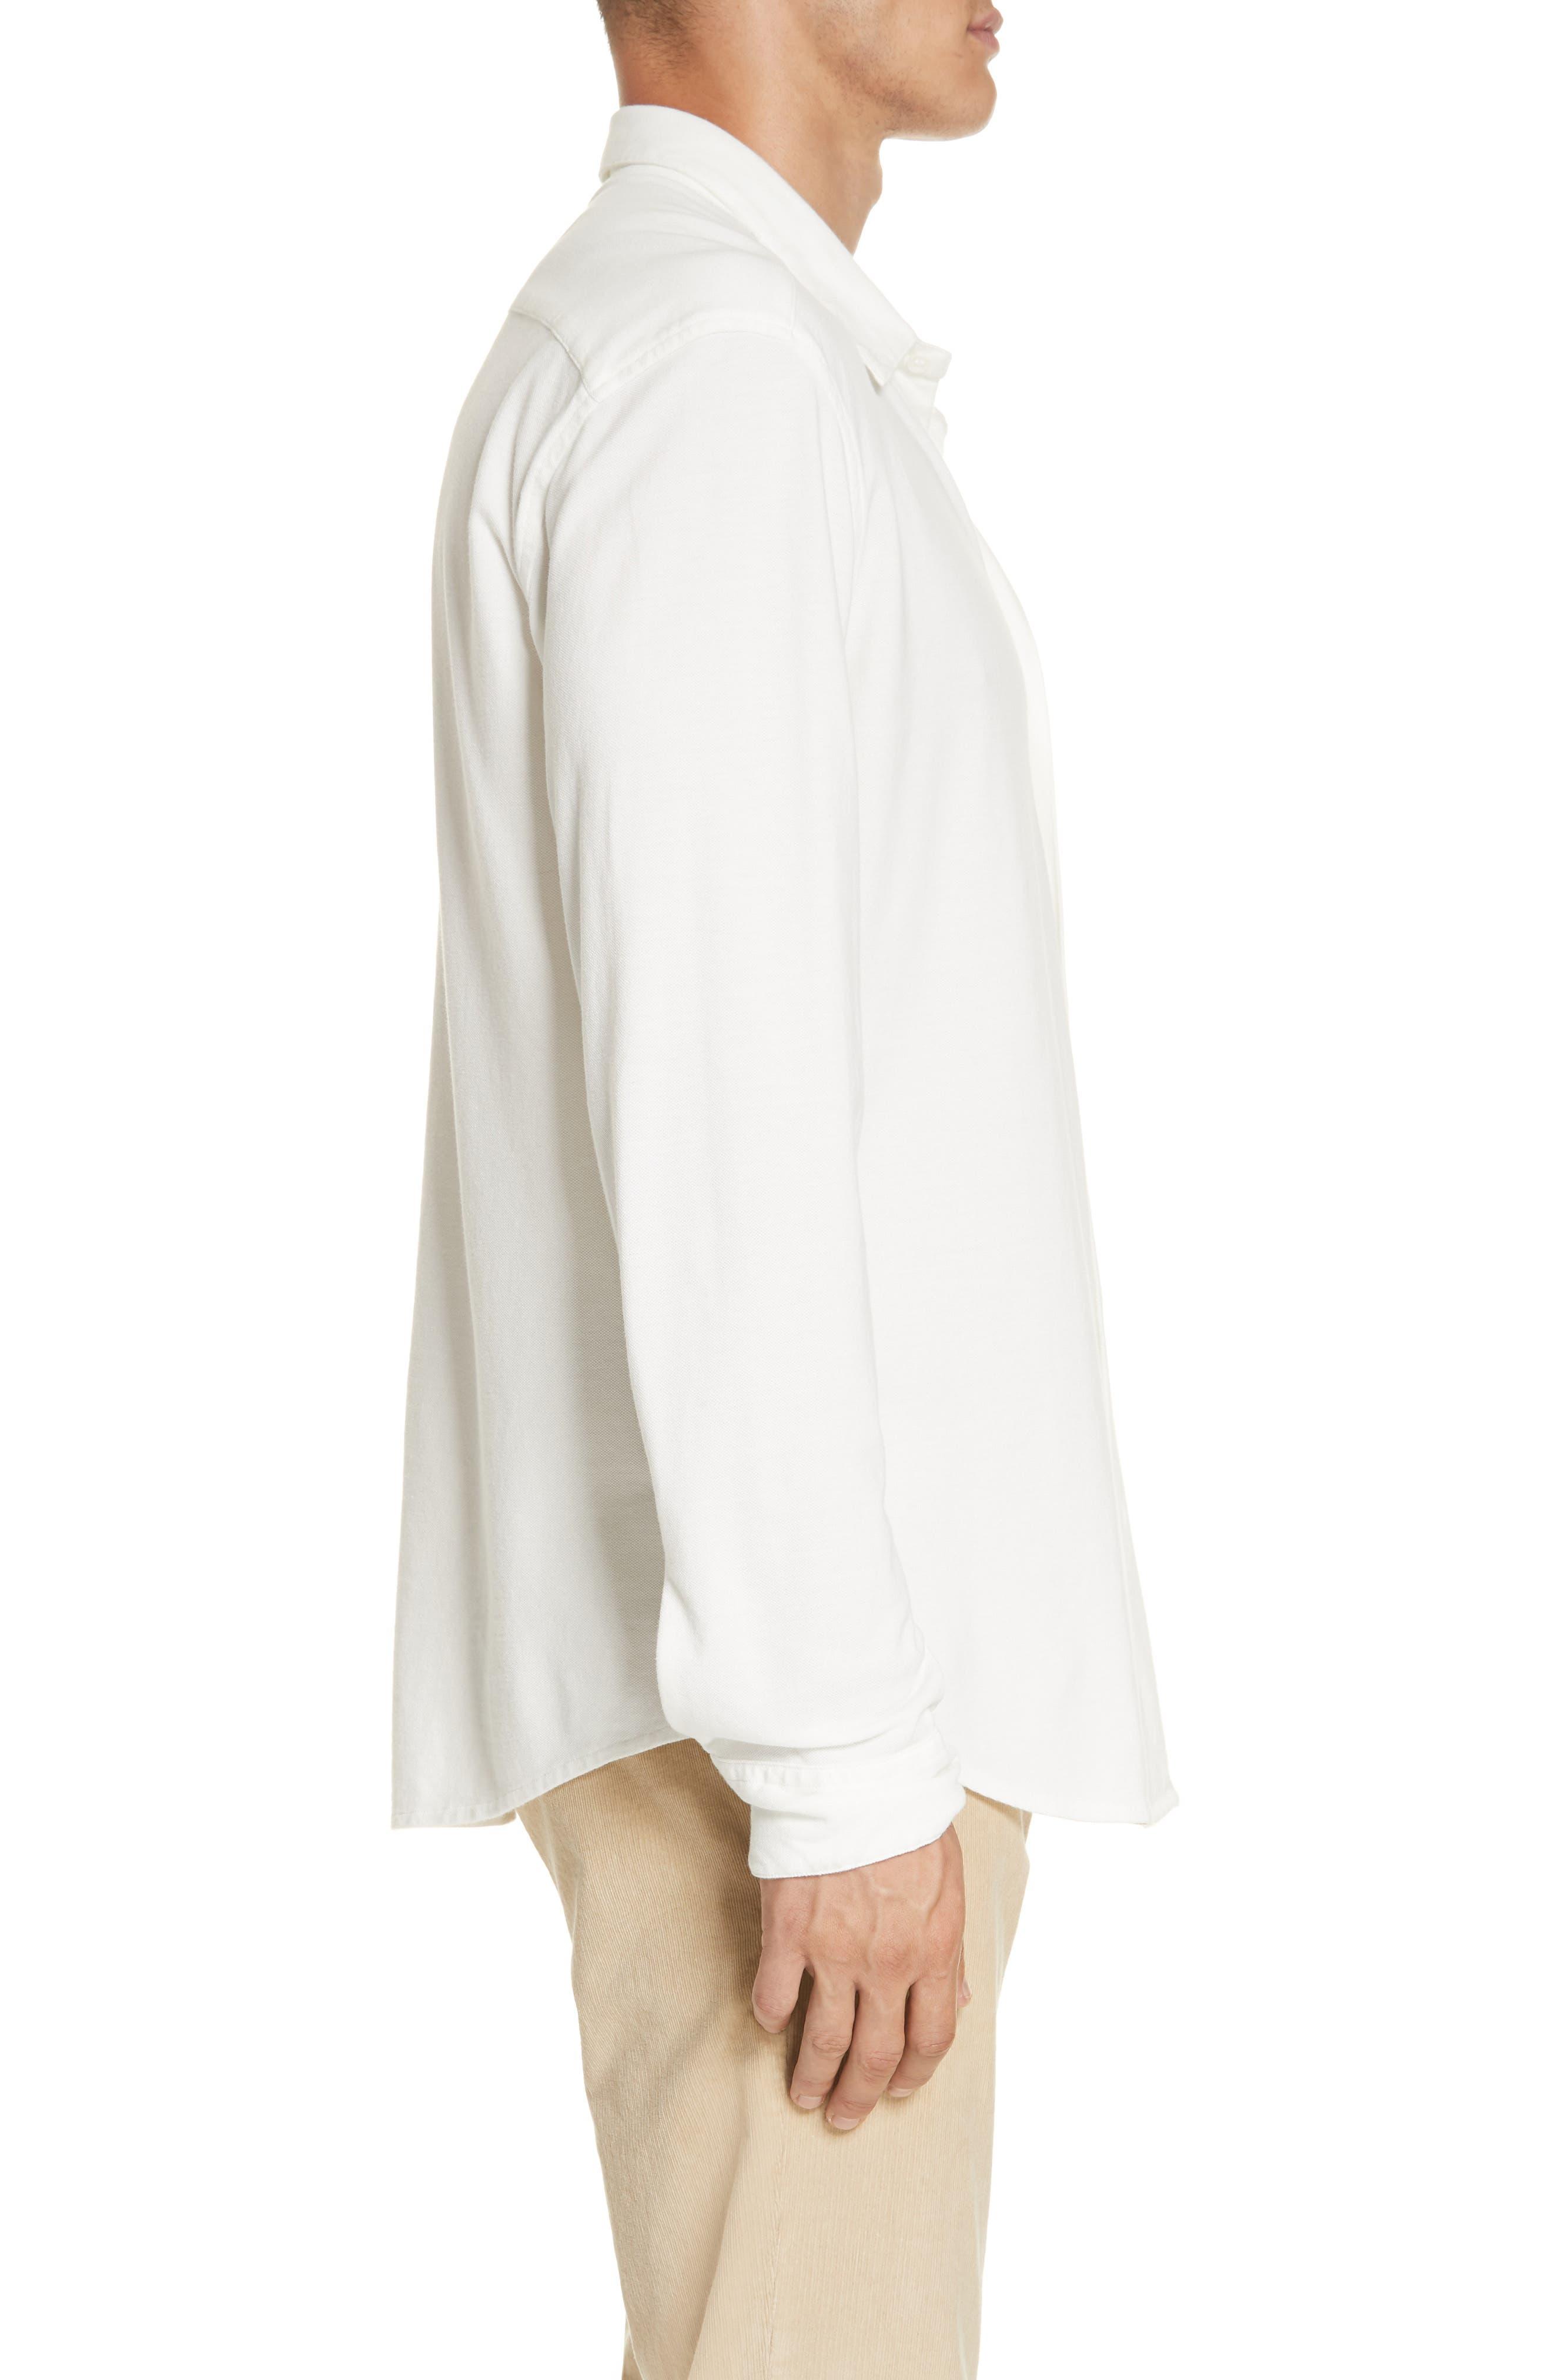 Coppi Tamiso Sport Shirt,                             Alternate thumbnail 3, color,                             WHITE